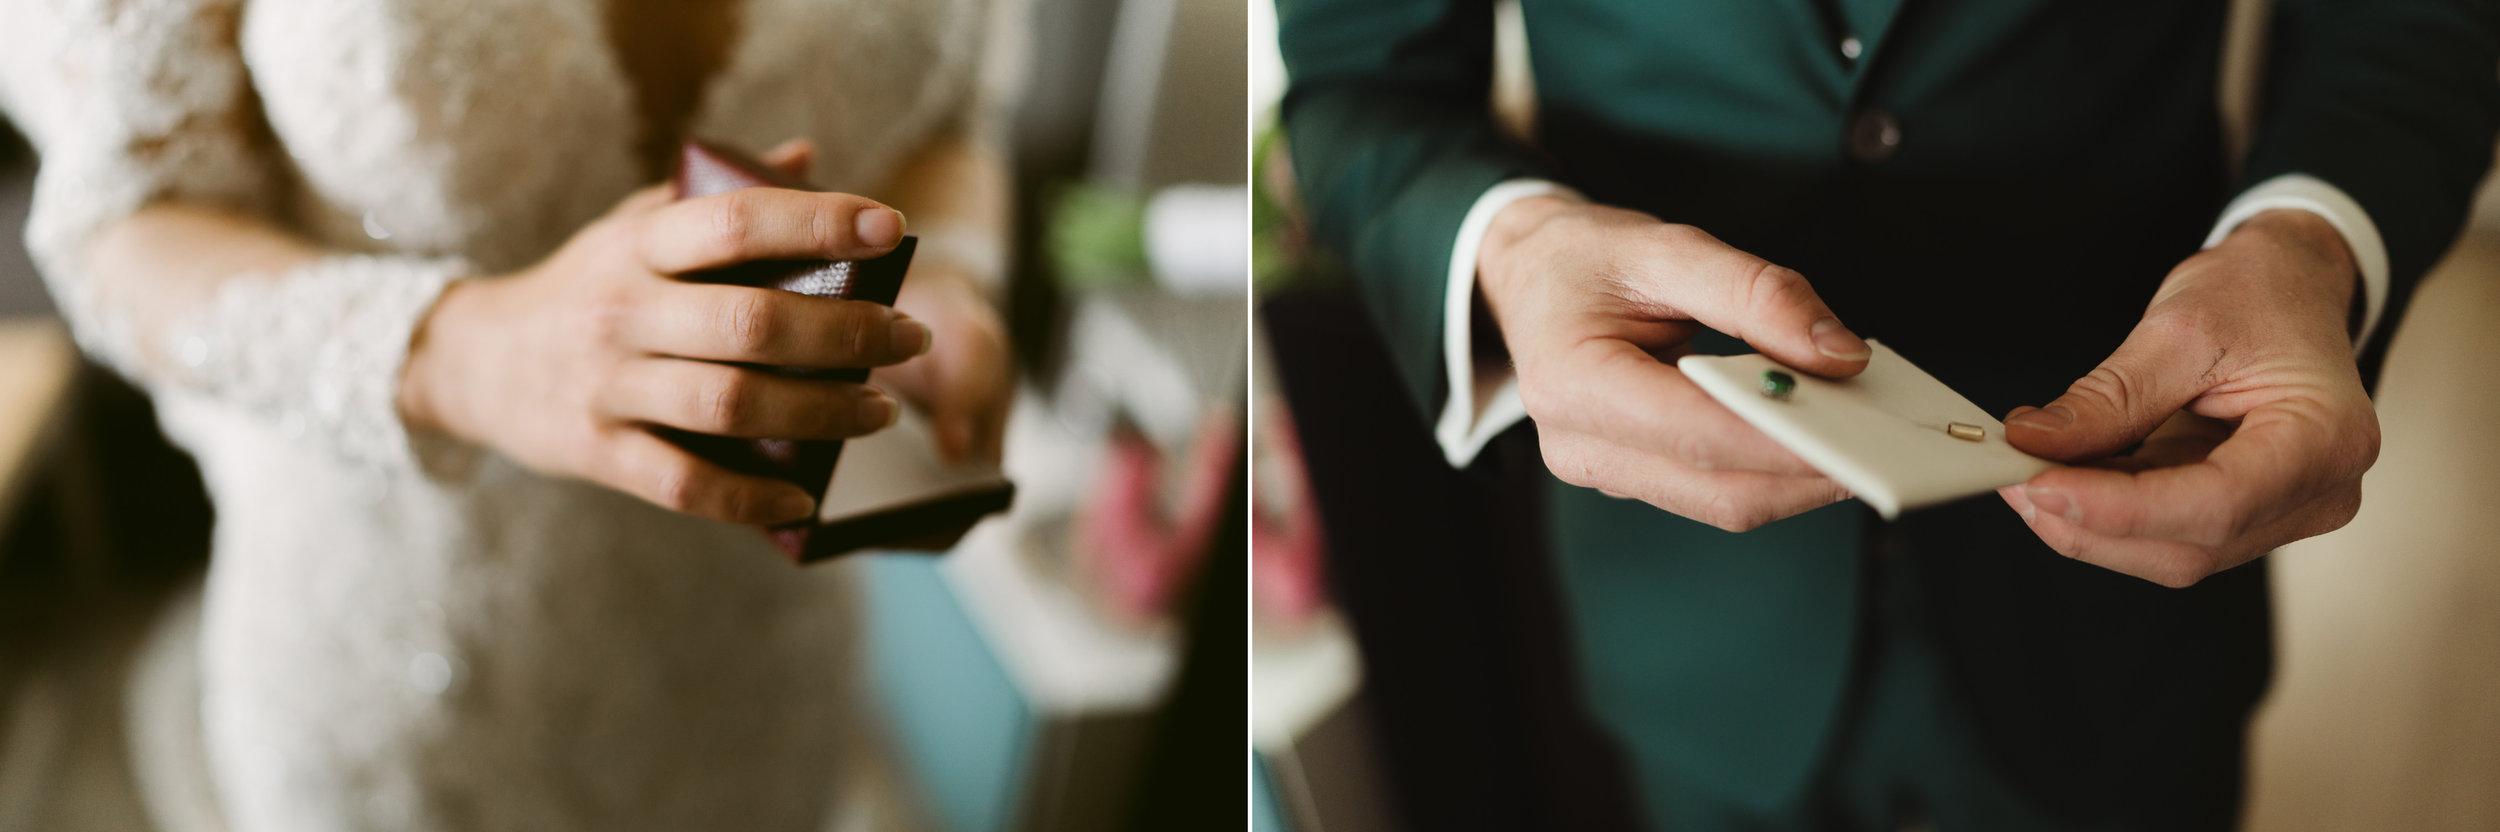 bruidsfotografie-amsterdam-utrecht-trouwfotograaf-mark-hadden-wedding-photography-Robin & Guus-009 copy.jpg